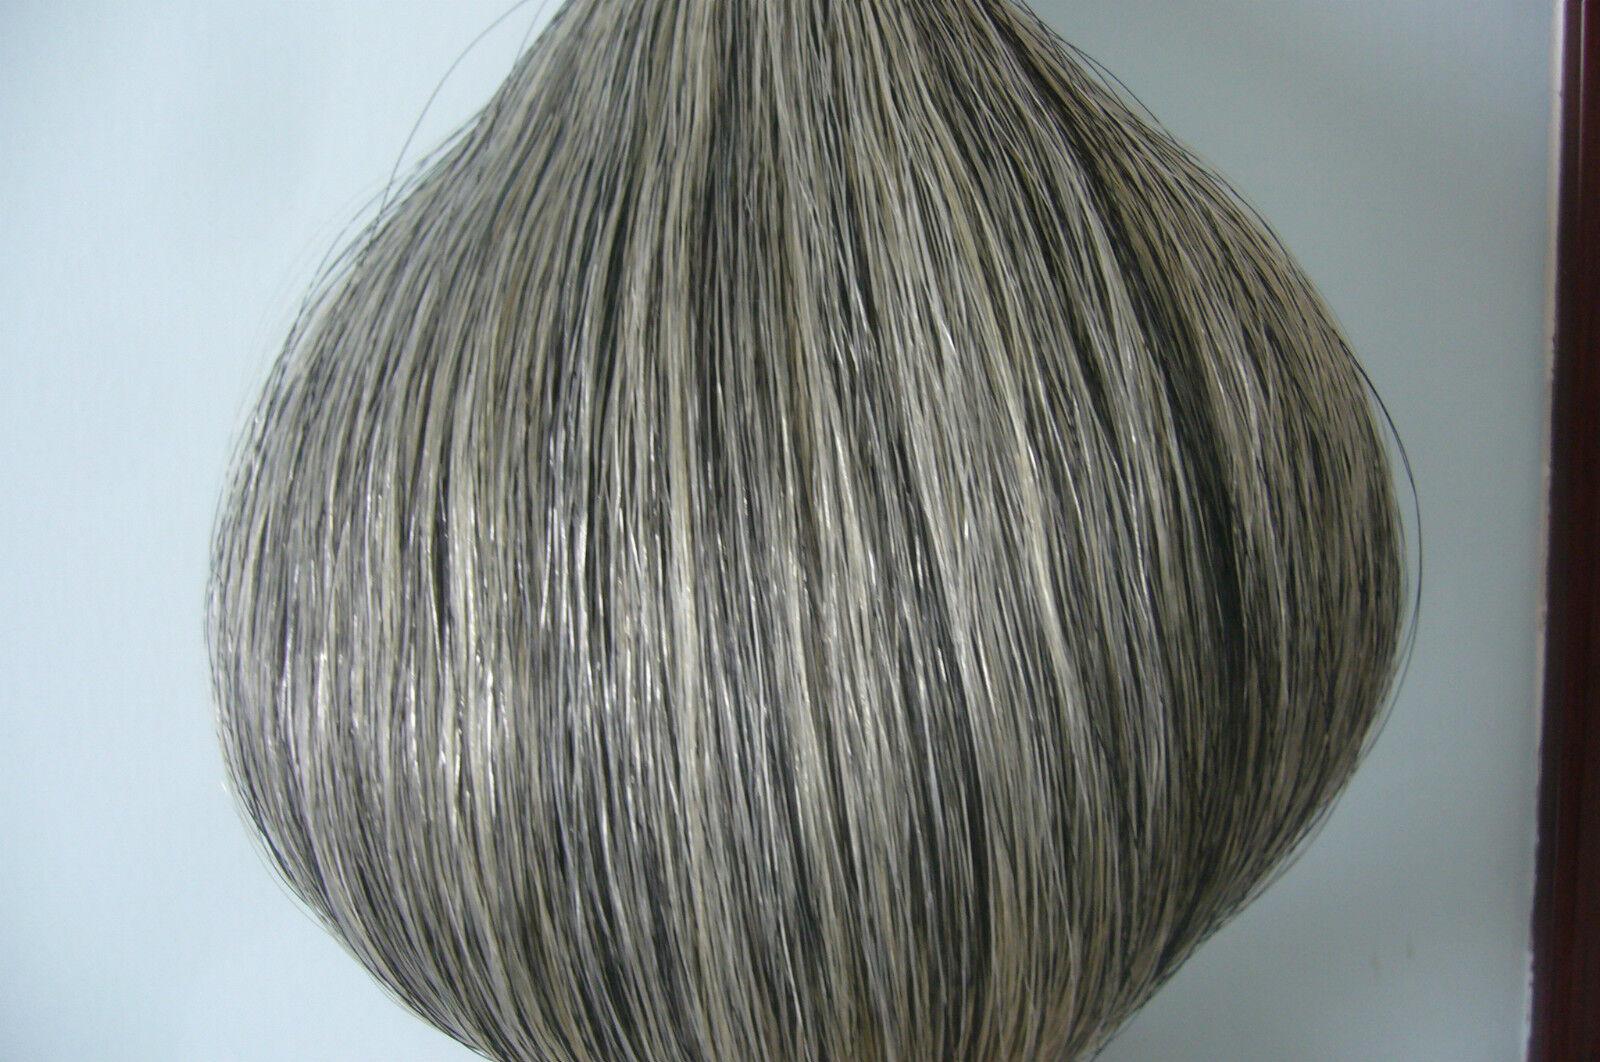 New Light Grey Horse Tail Hair Extension 90cm 1 2 Lb half pound hair